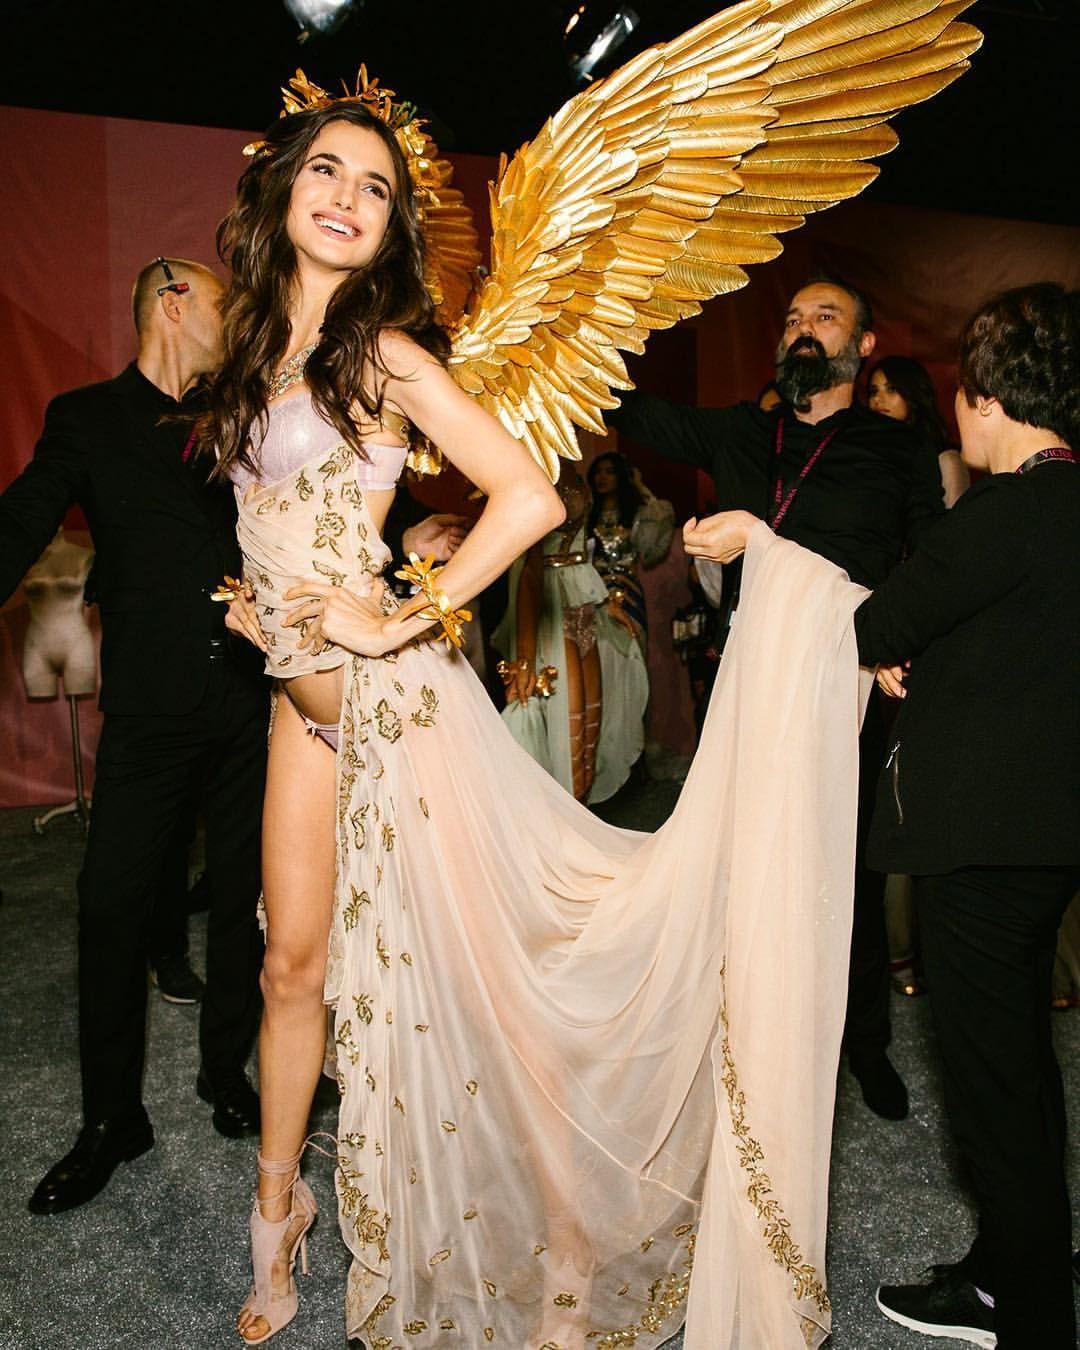 Vicsecret Angels Blanca Padilla: 77.6k Likes, 504 Comments